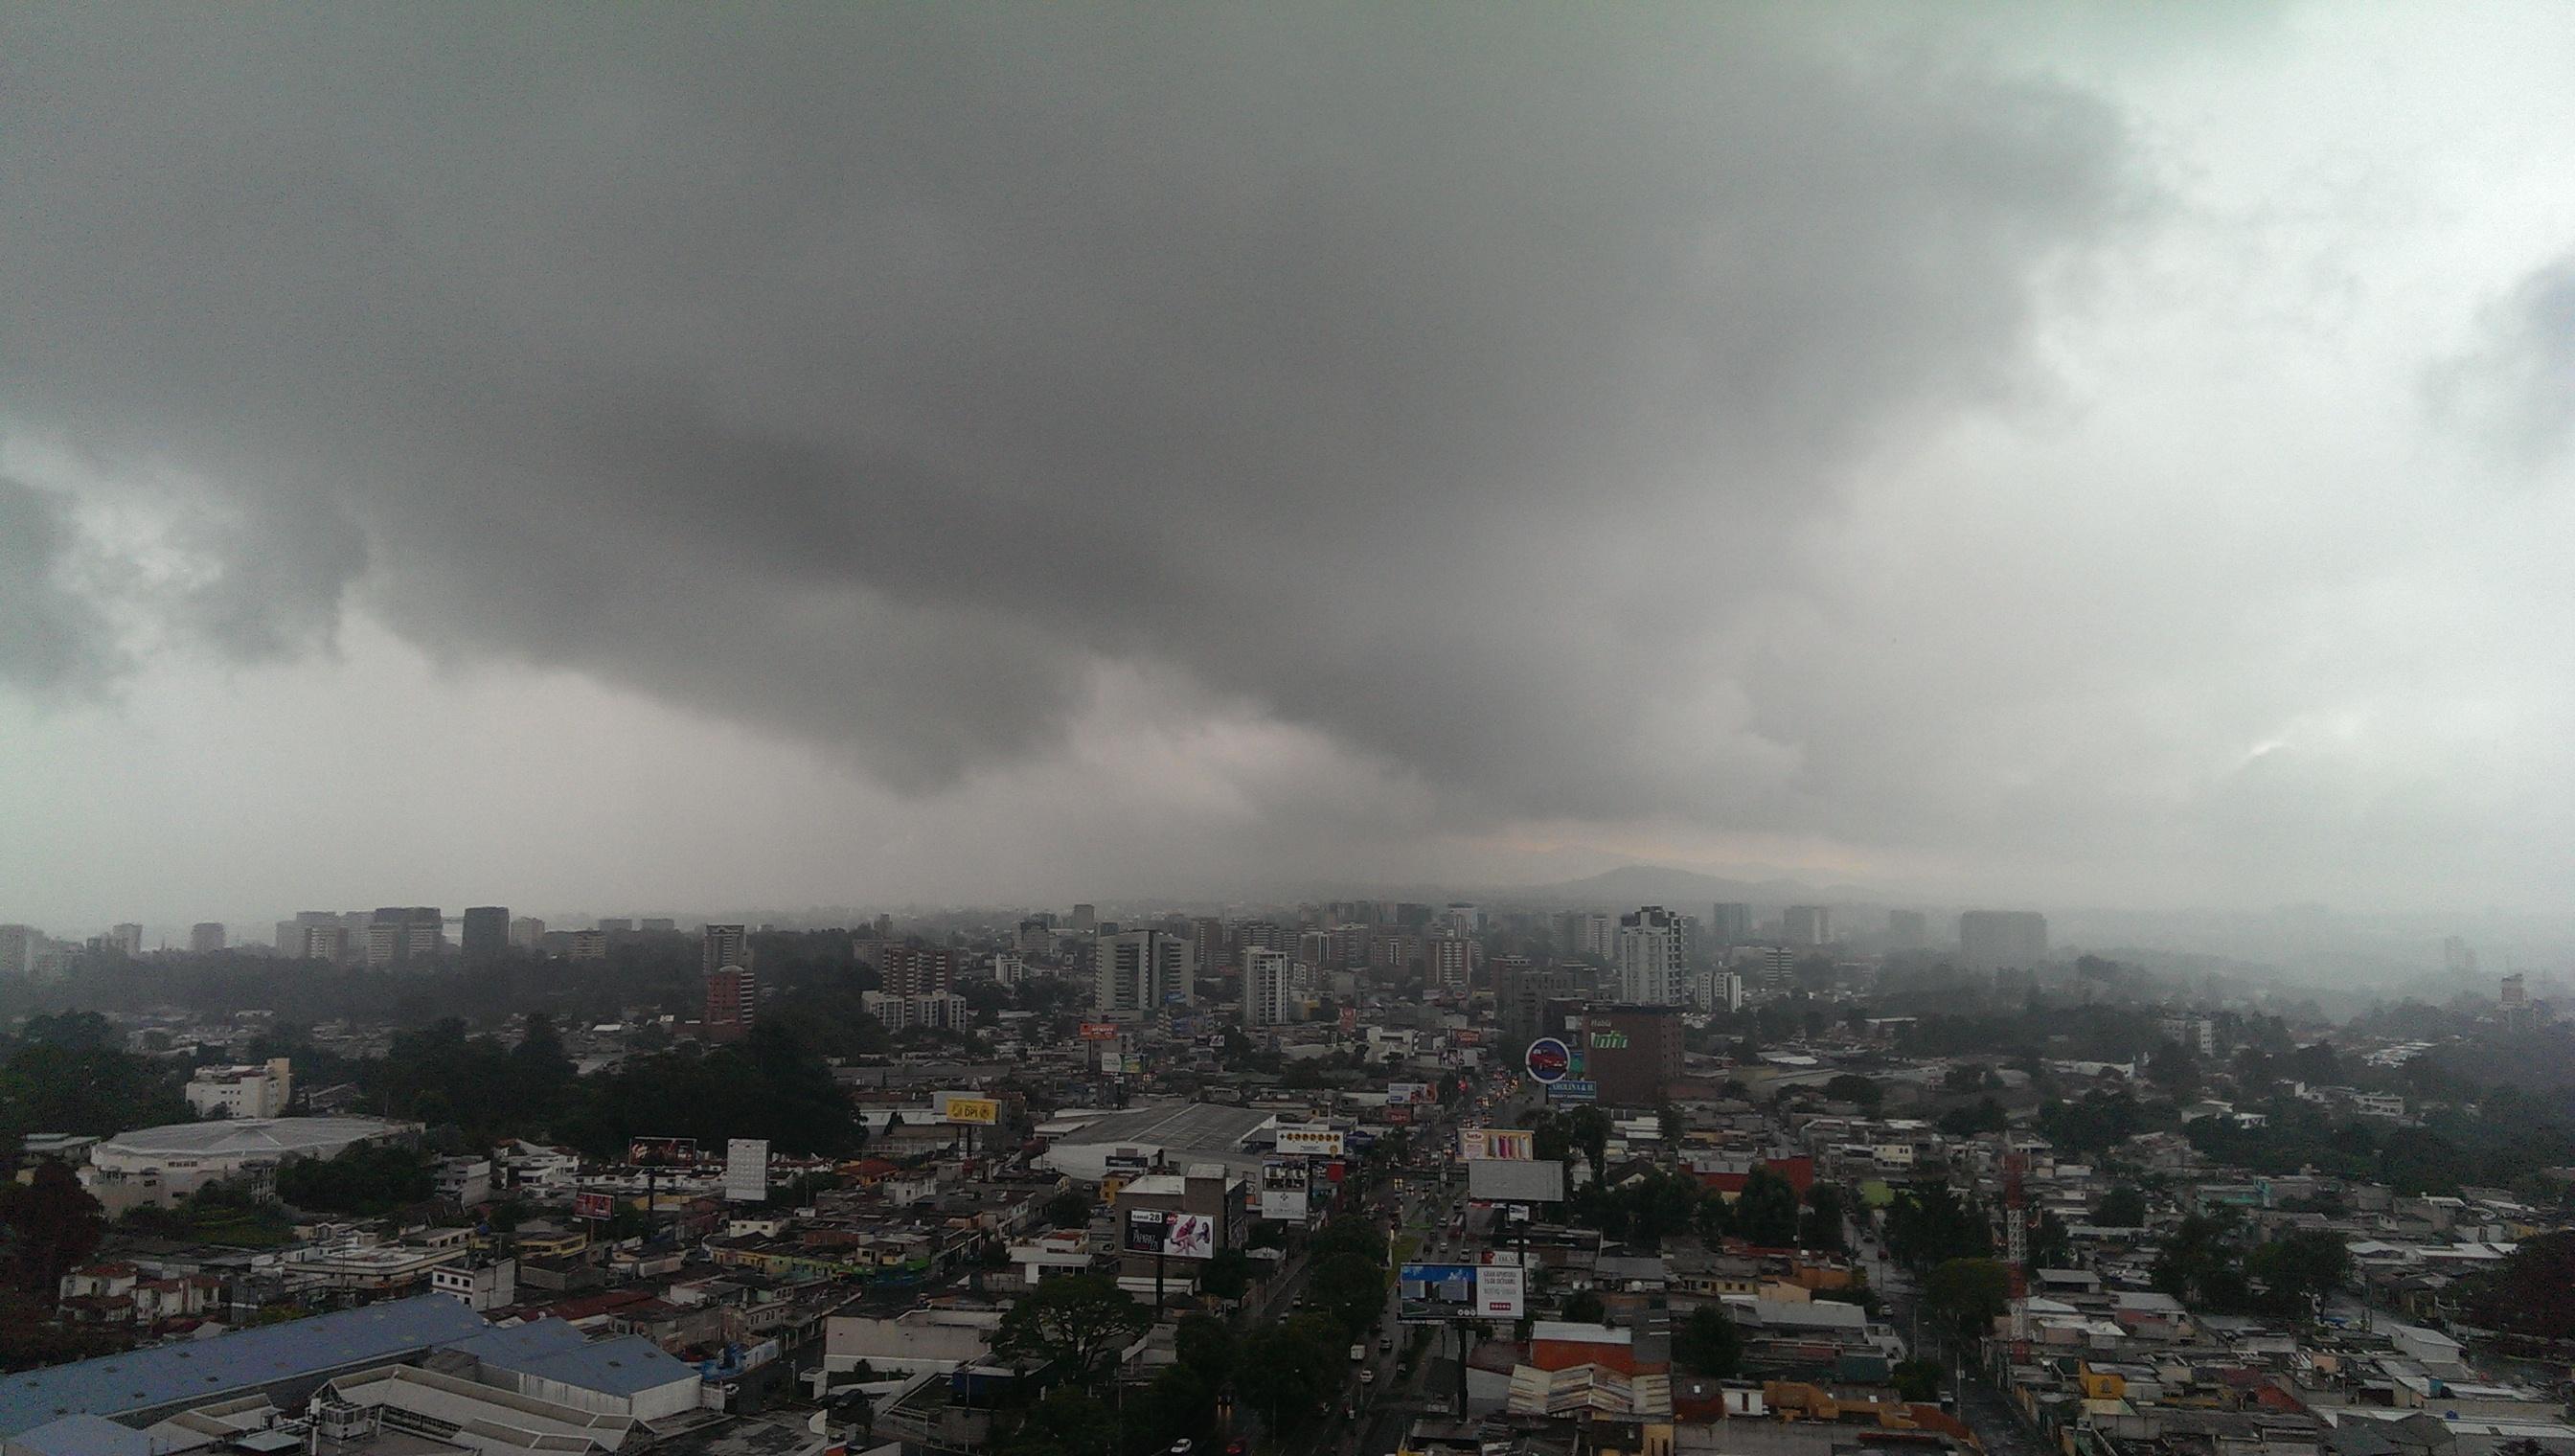 Torrenciales lluvias en la capital